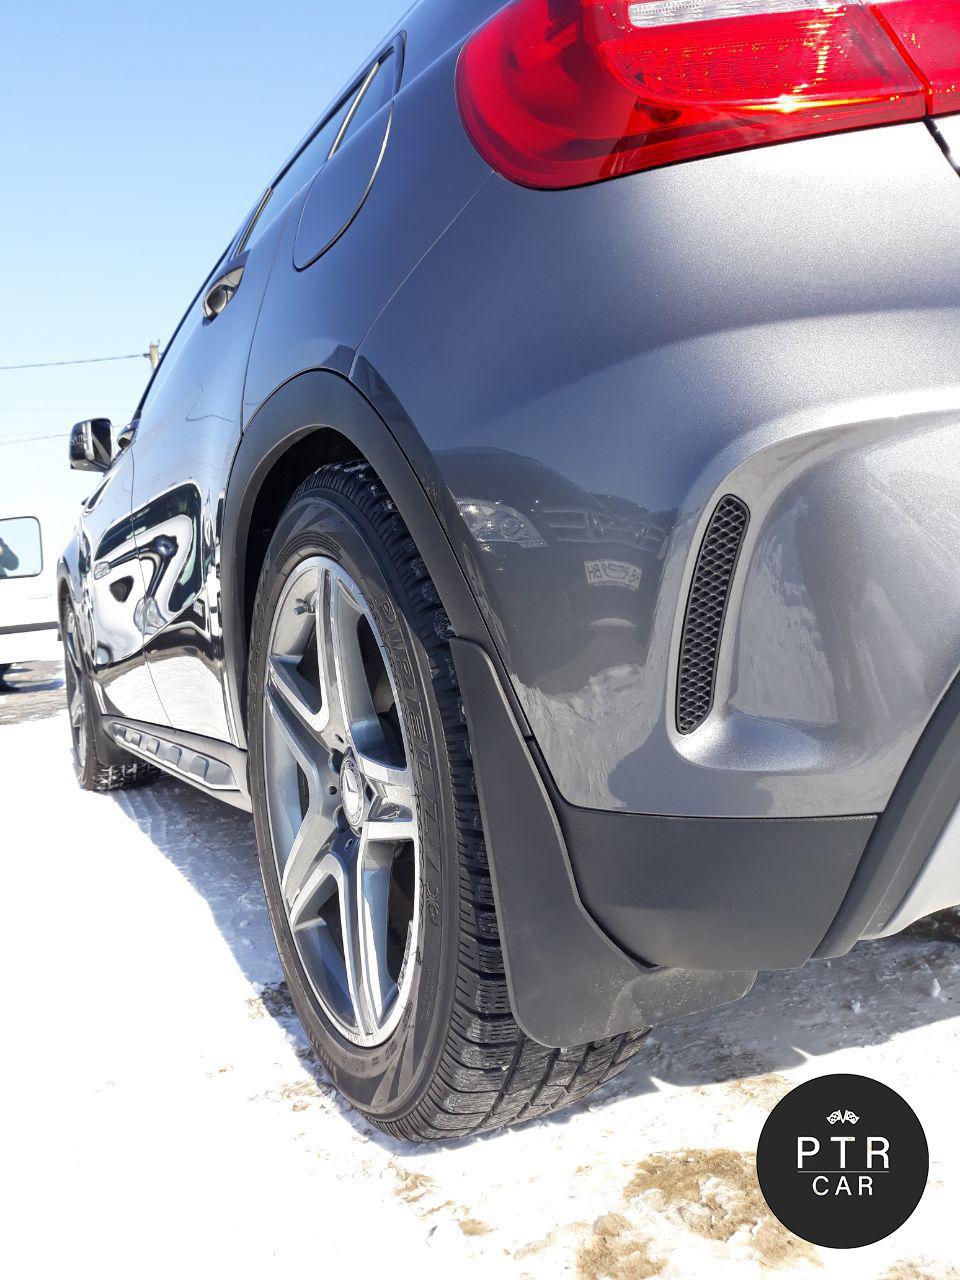 Брызговики Audi A6 2015- (полный кт 4-шт), кт.